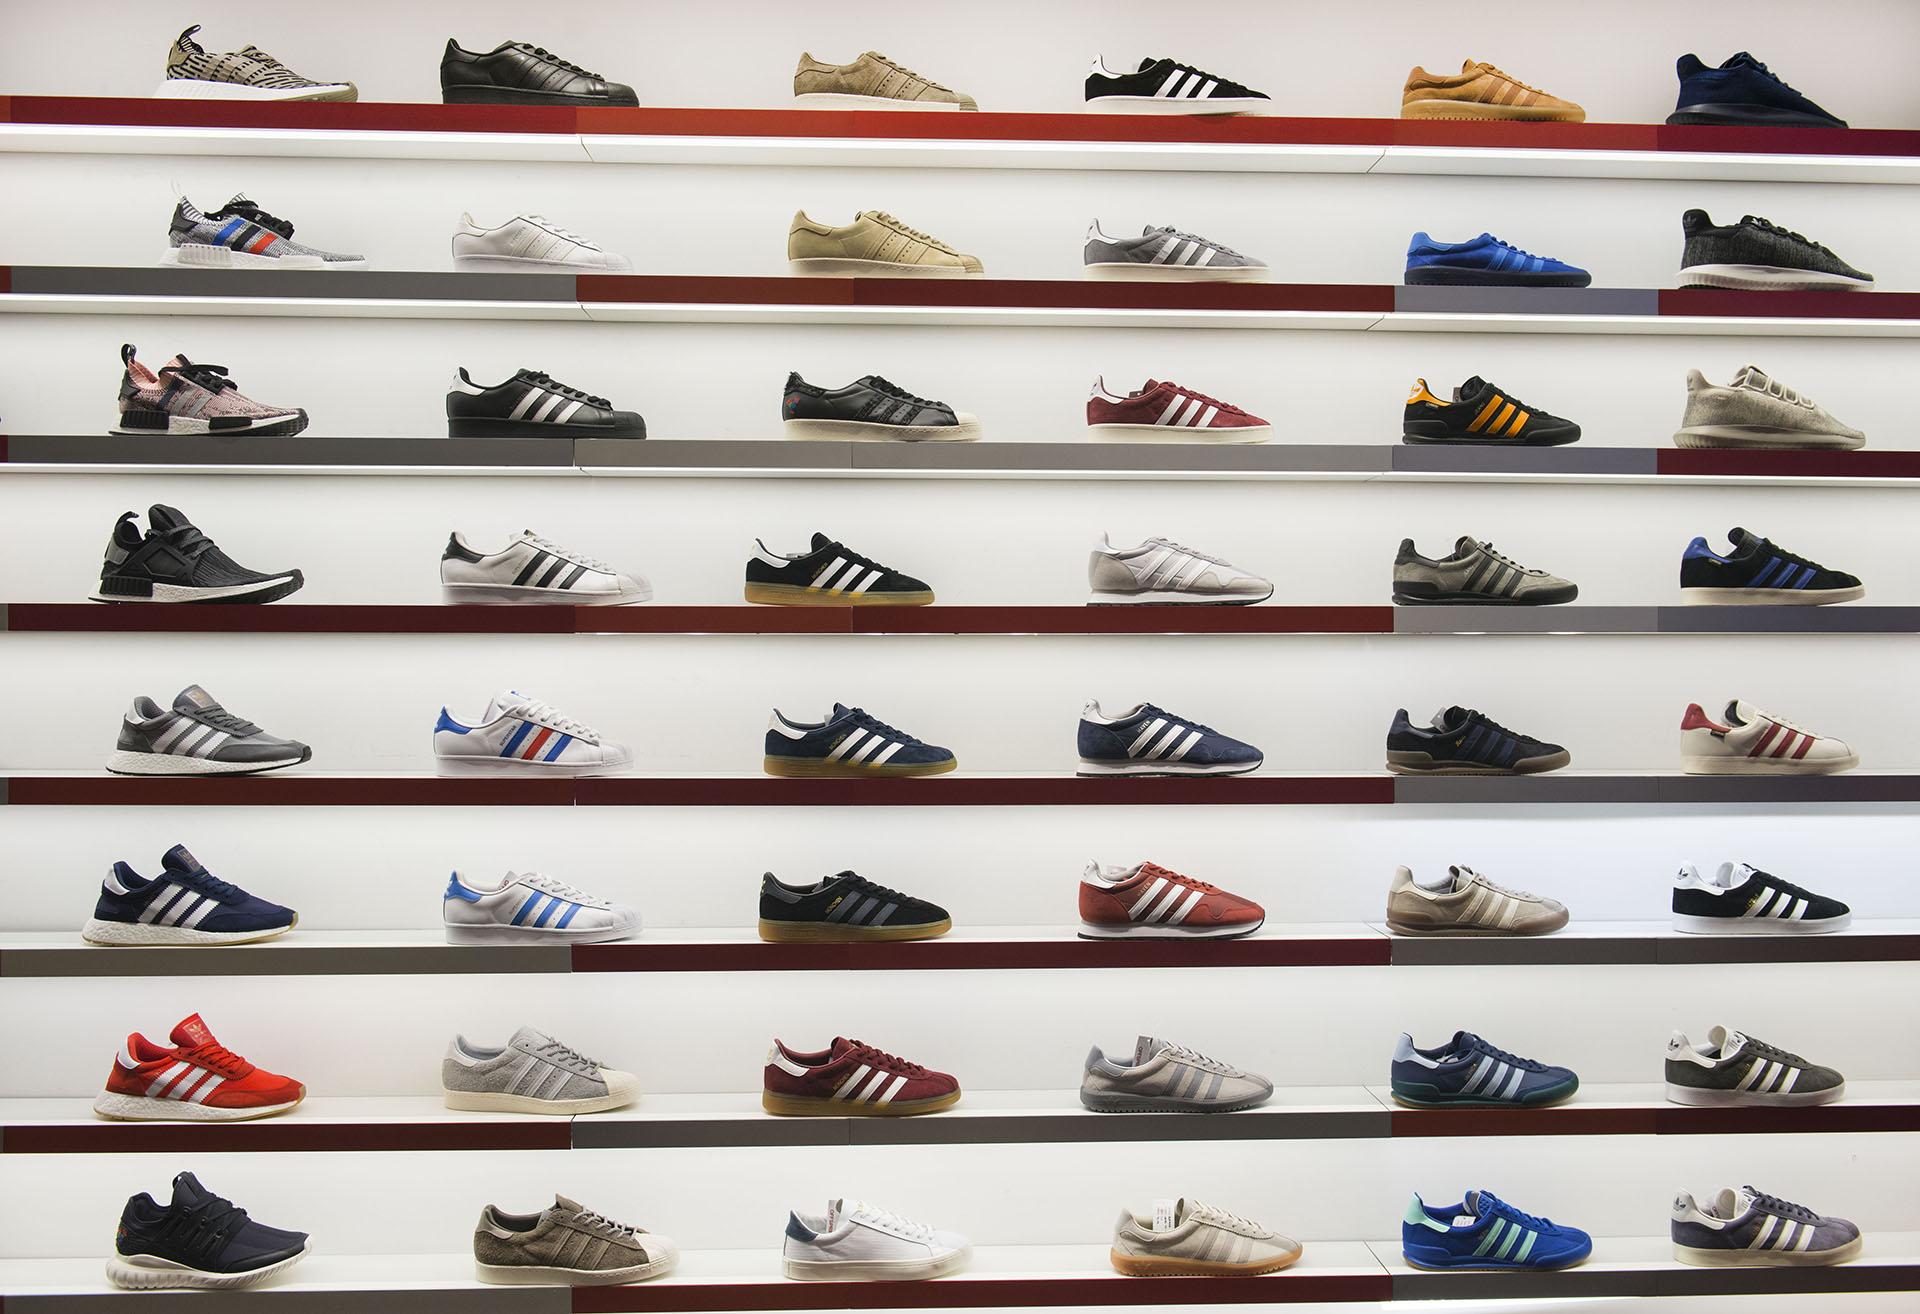 Adidas trainer display, Selfridges Manchester, Fashion photography Jon Parker Lee